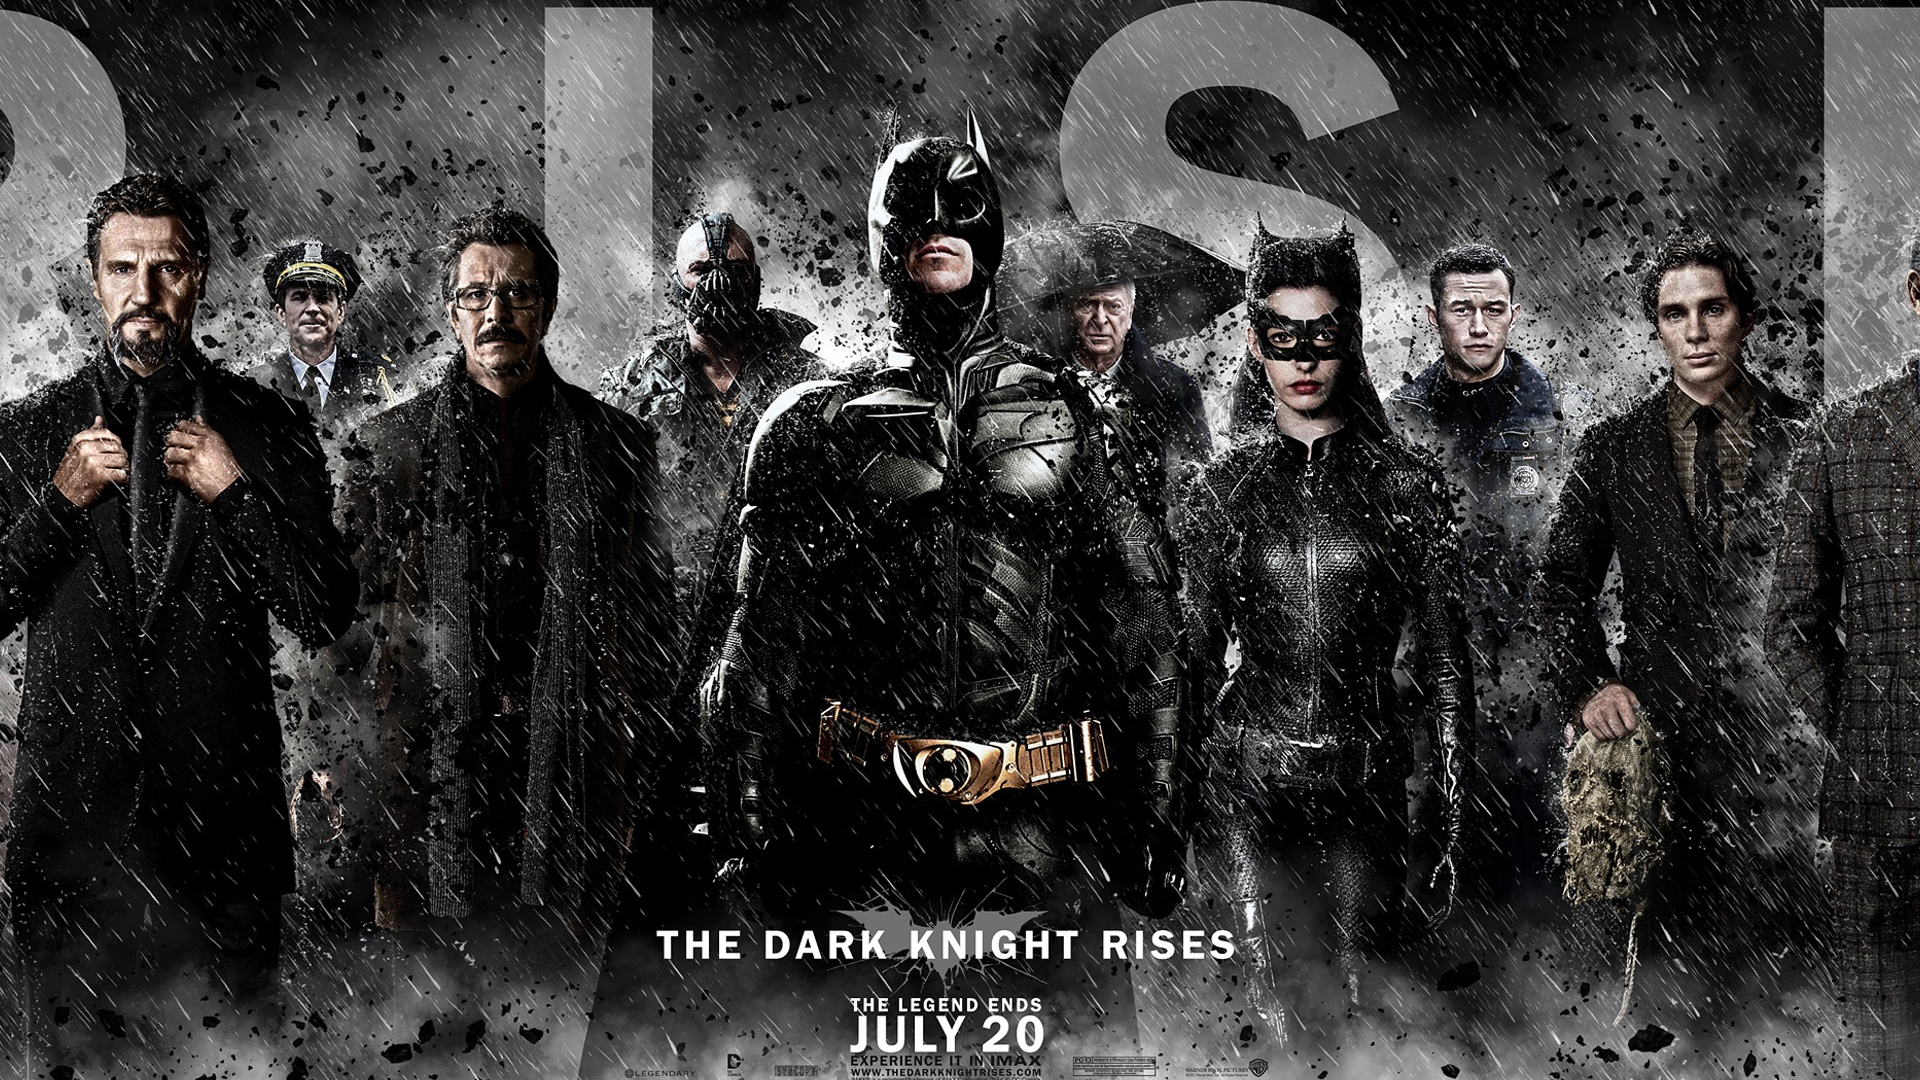 Wallpaper 2012 The Dark Knight Rises 1920x1200 Hd Picture Image